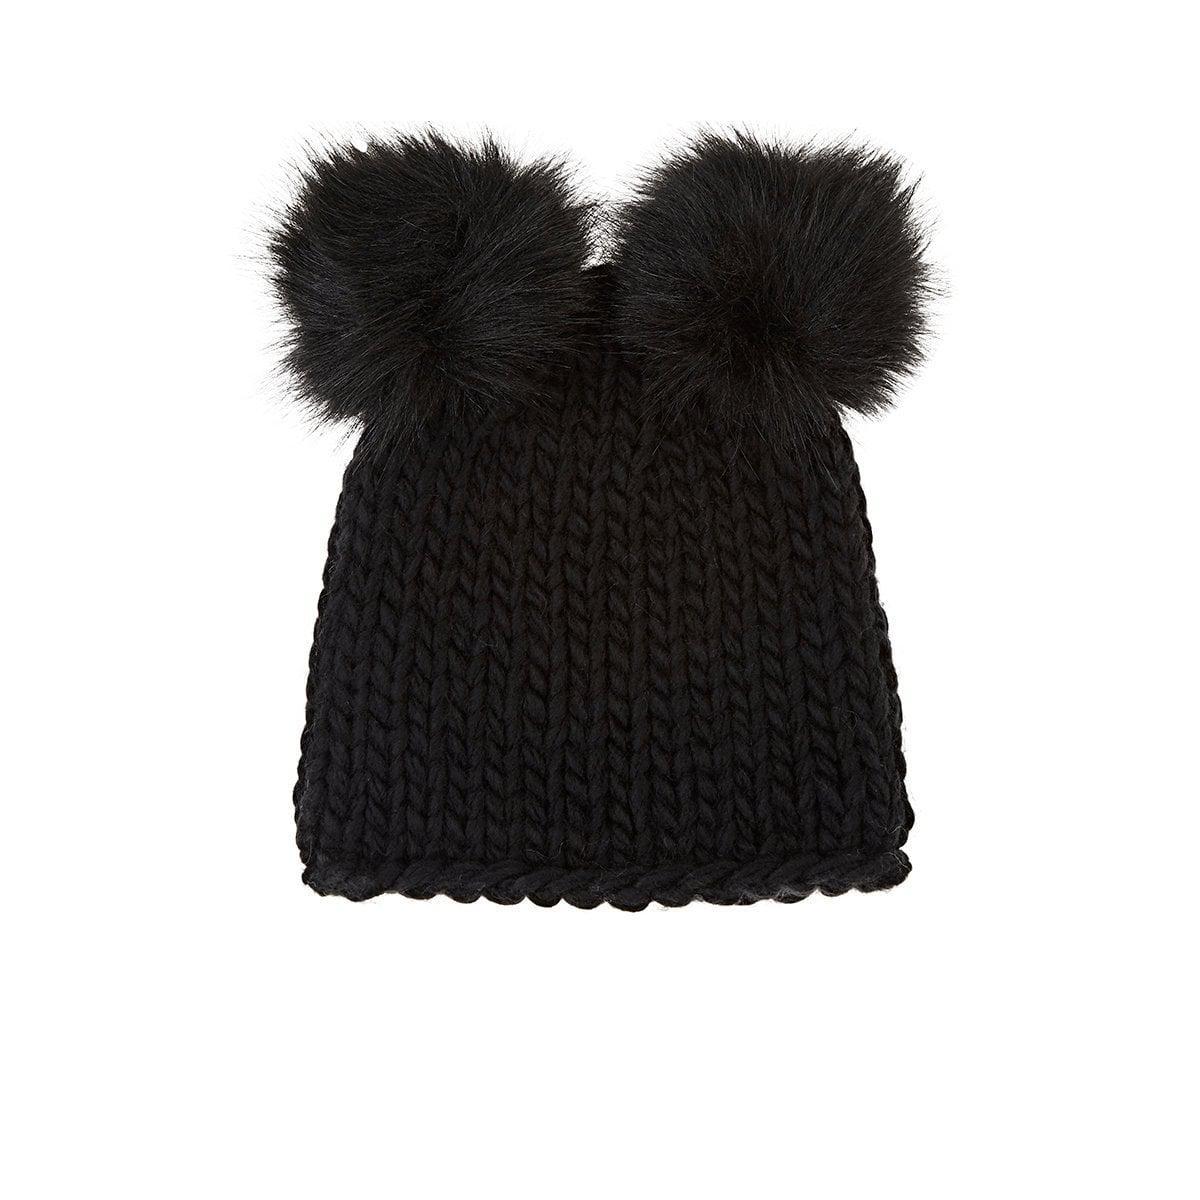 abf0e8b80da Gallery. Previously sold at  Barneys Warehouse · Women s Von Dutch Trucker Hats  Women s Wool ...